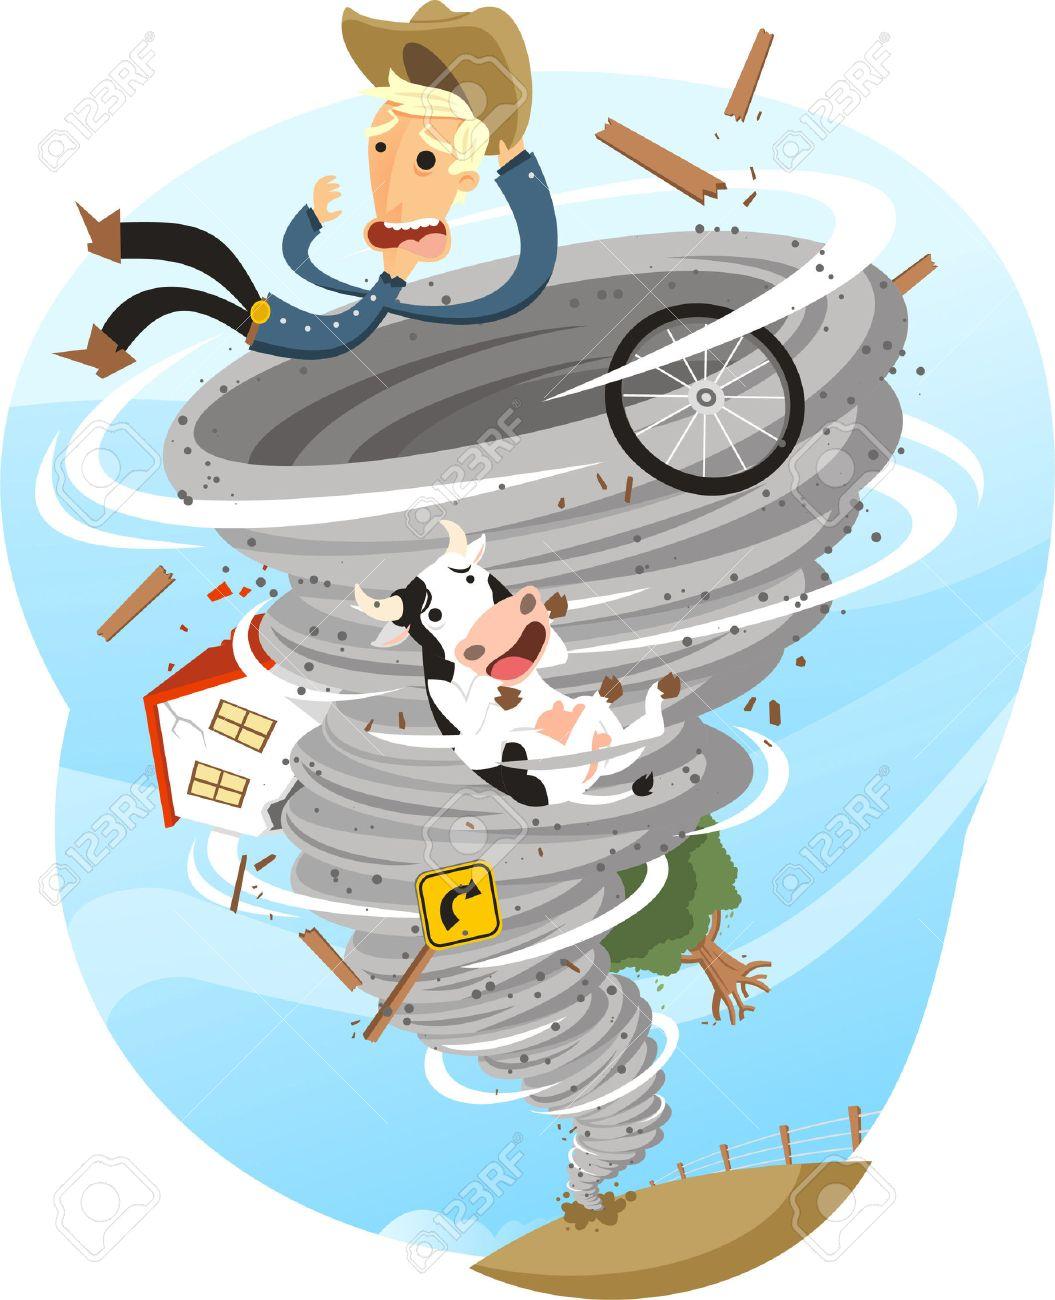 Tornado Storm Twister Cloud Wind Rain Weather, vector illustration cartoon. - 33995606